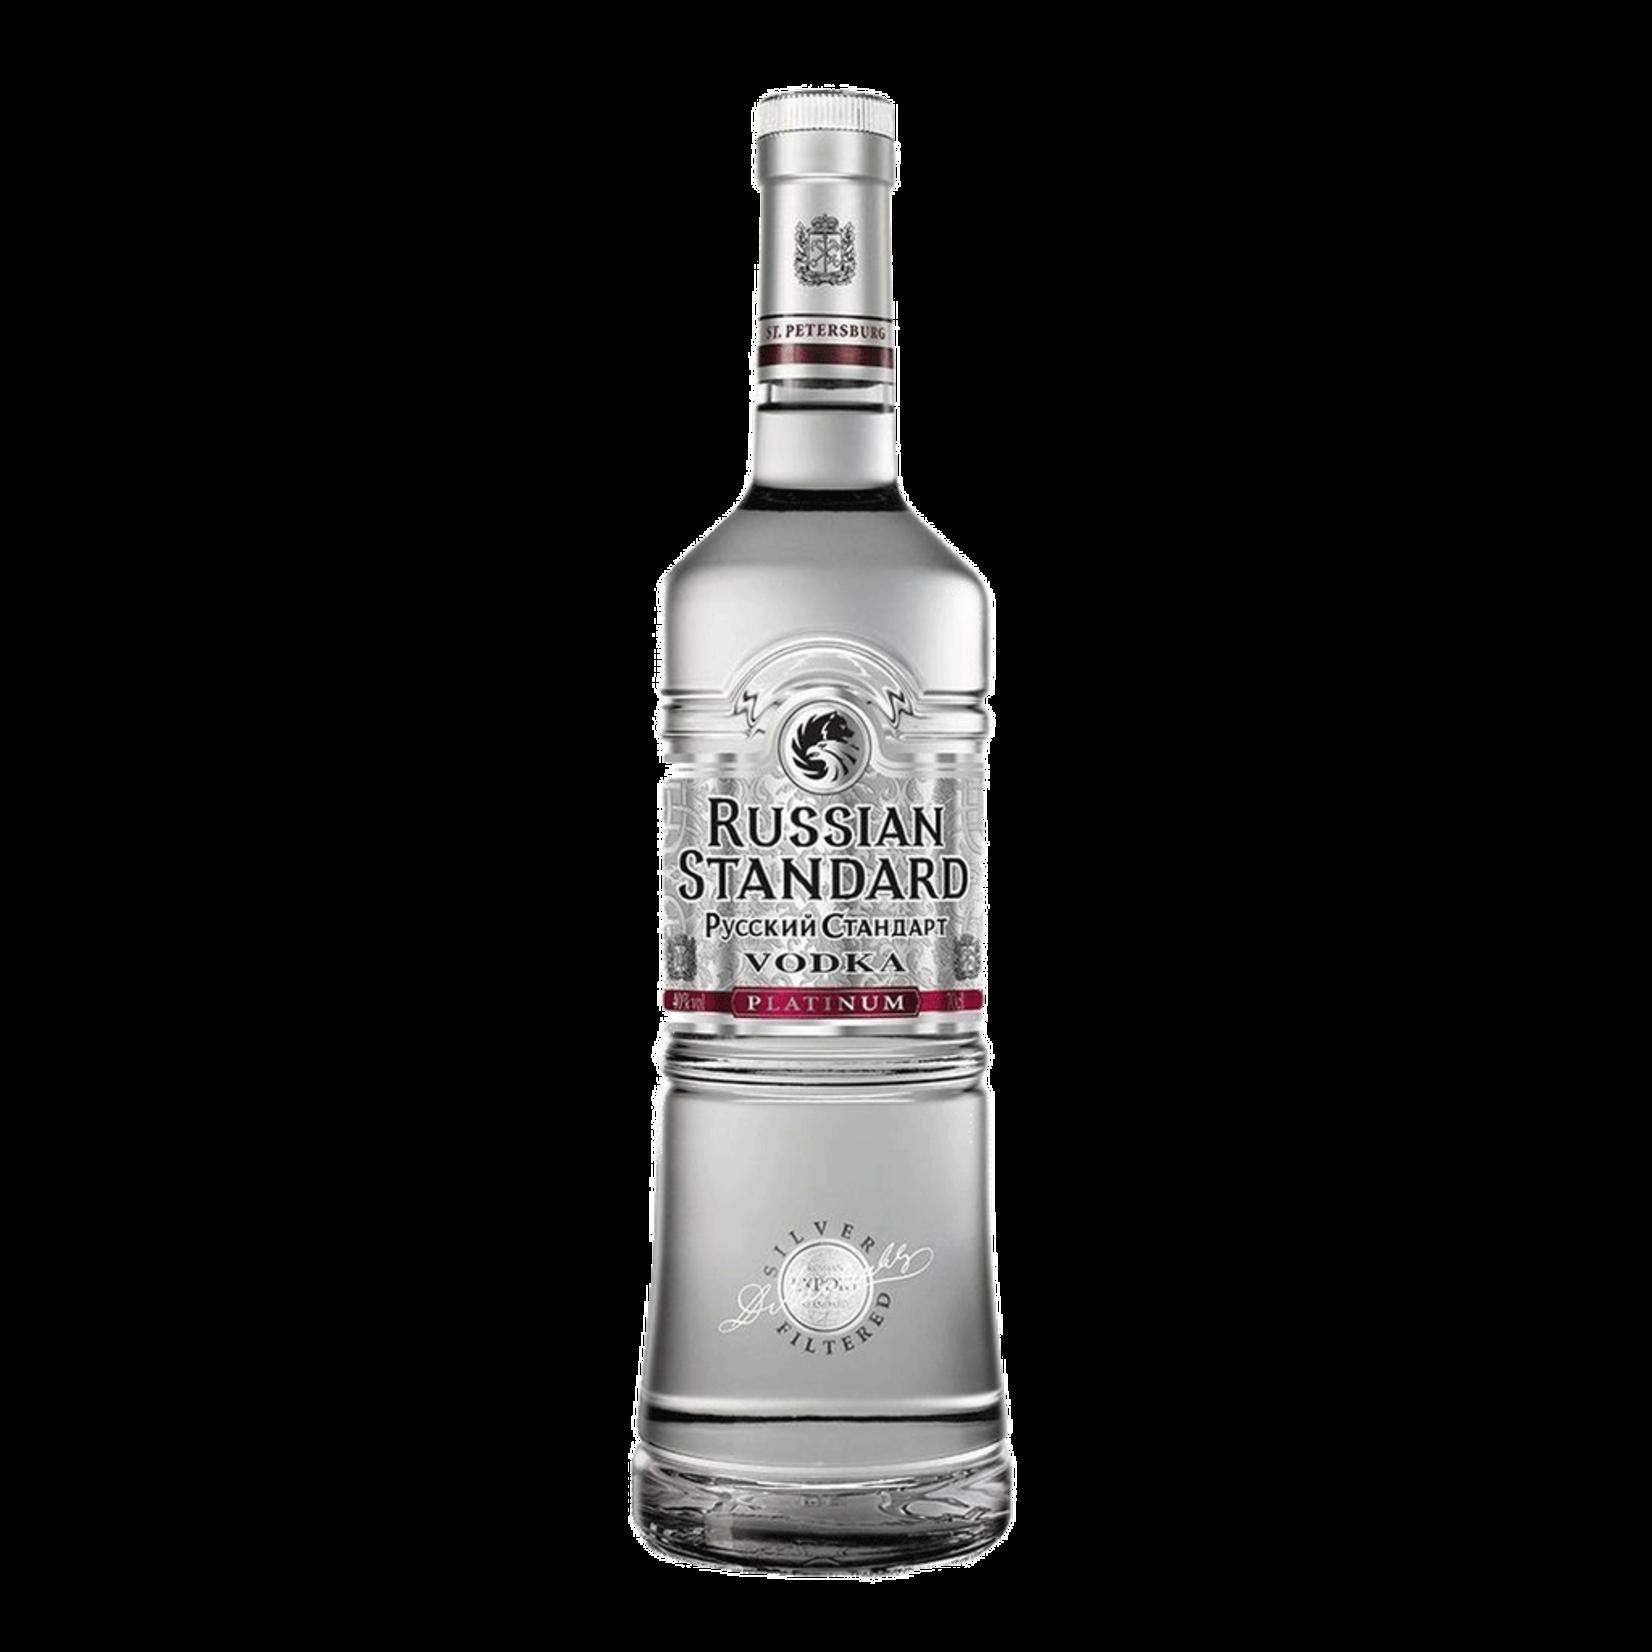 Russian Standard Platinum 750 ml